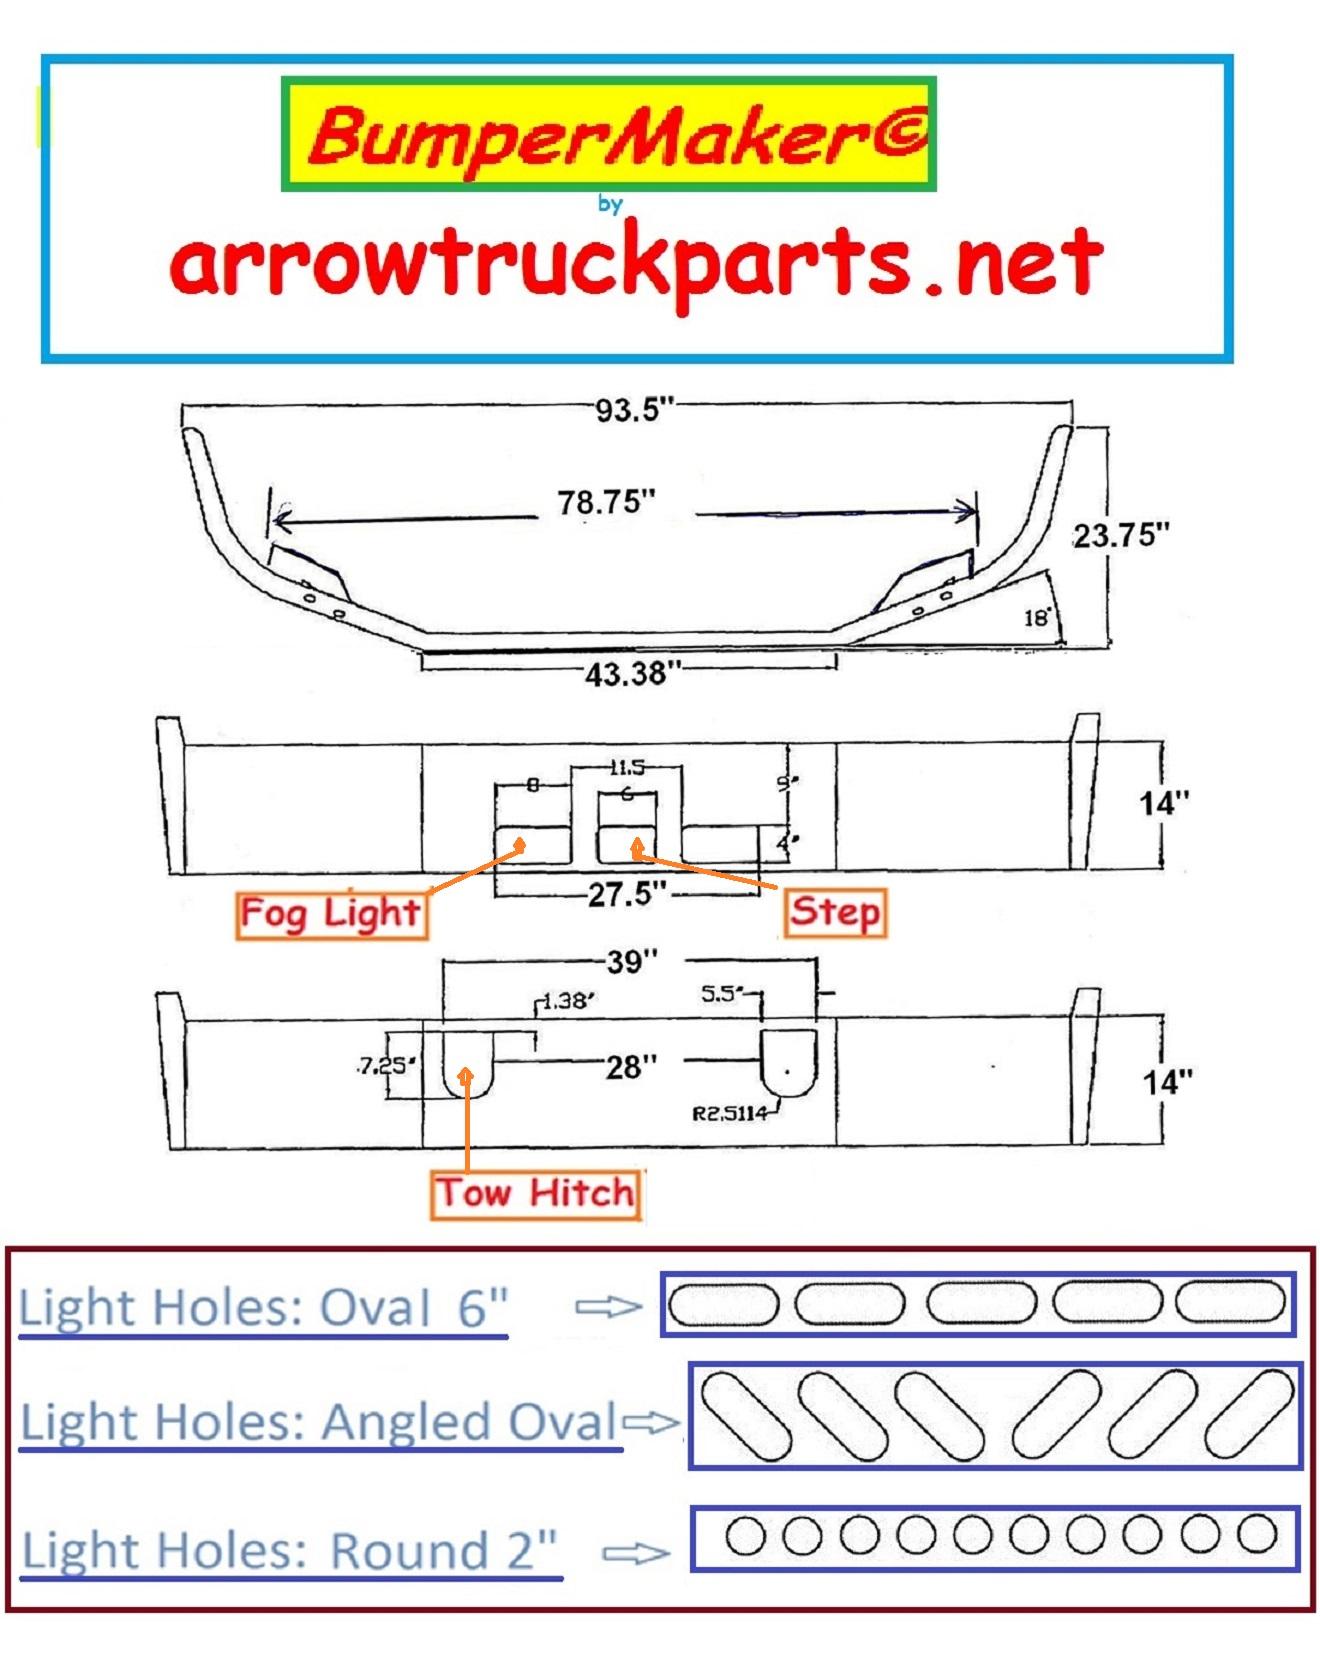 hight resolution of mack wiring schematics mack parts diagram mack special tools mack truck wiring